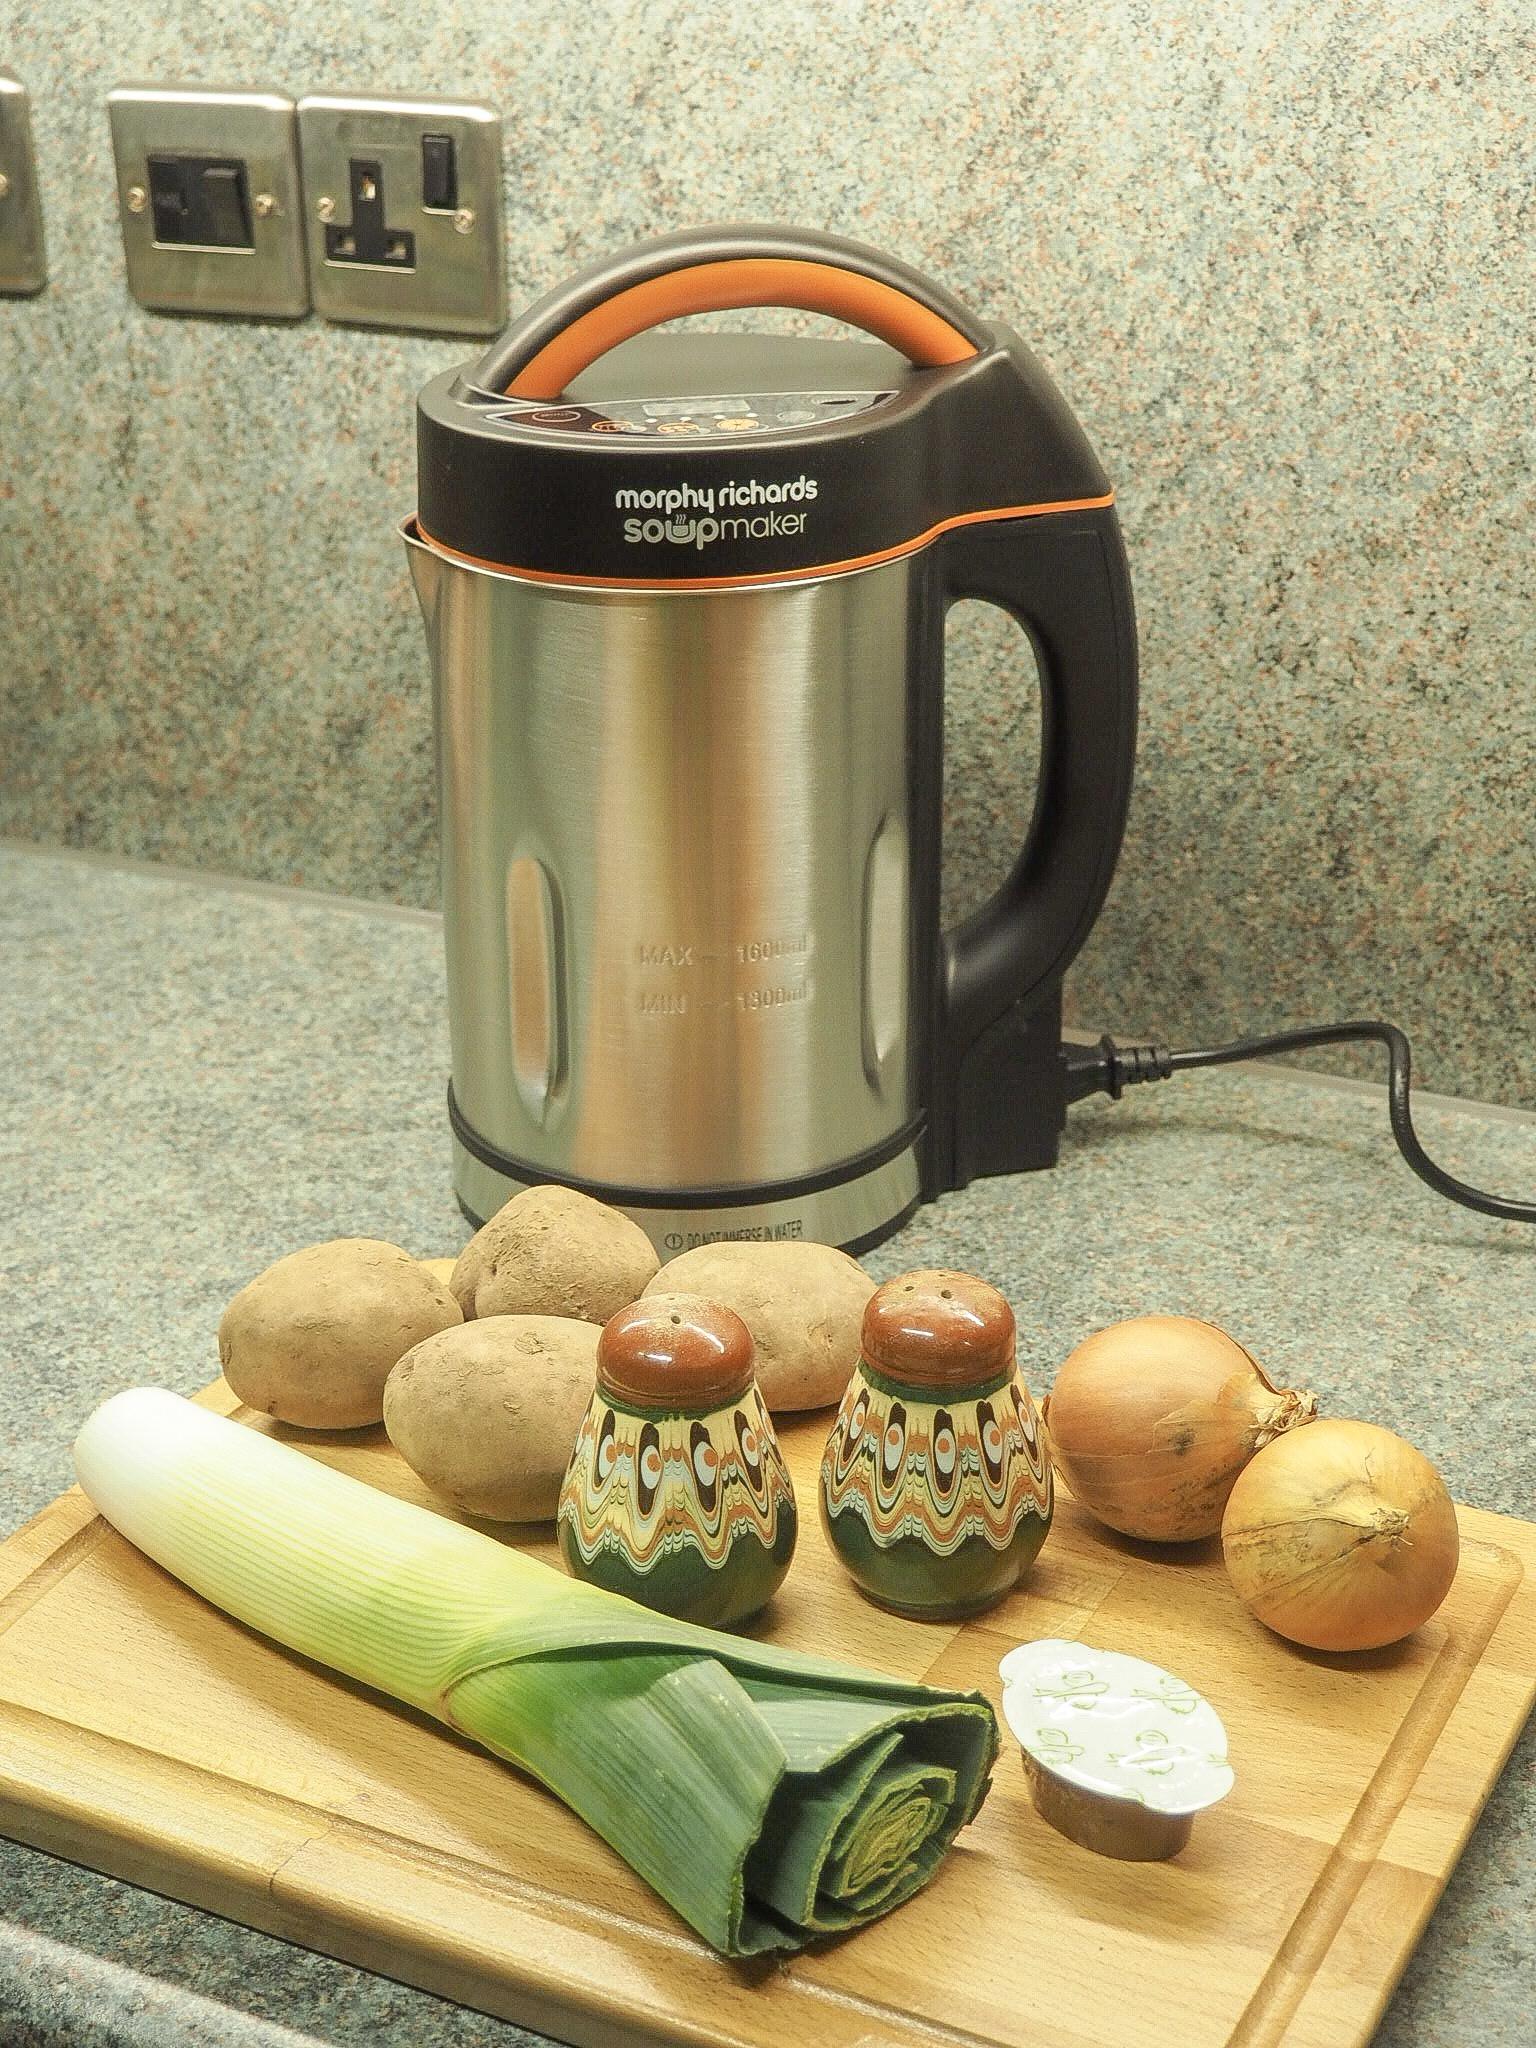 Morphy Richards soup maker recipes